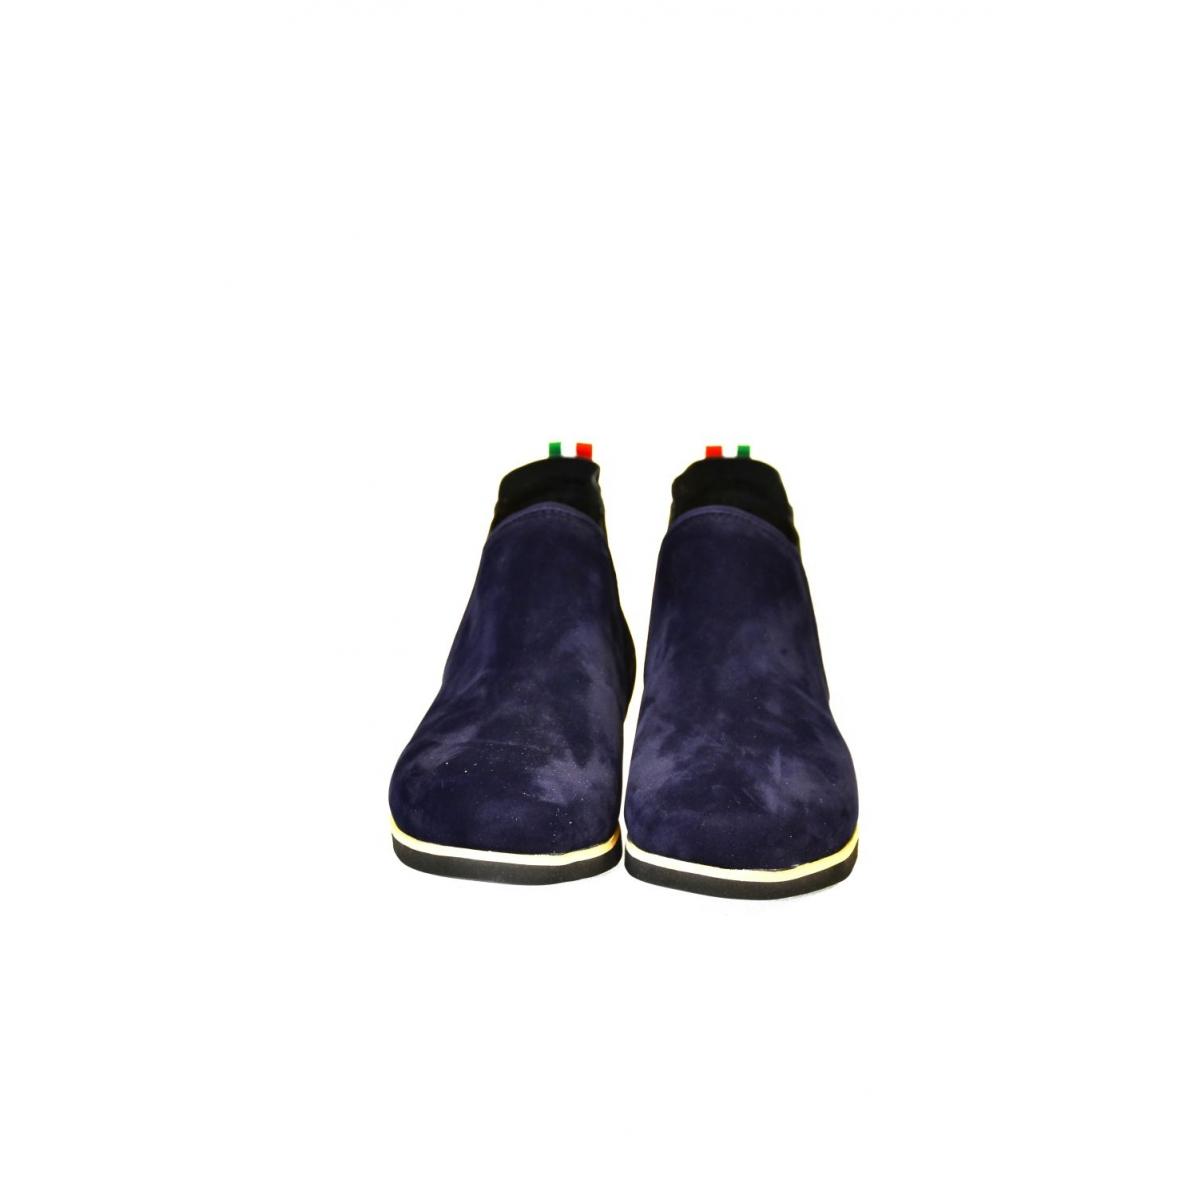 58afff1dfa Dámske tmavo-modré členkové topánky ORIOS - 4